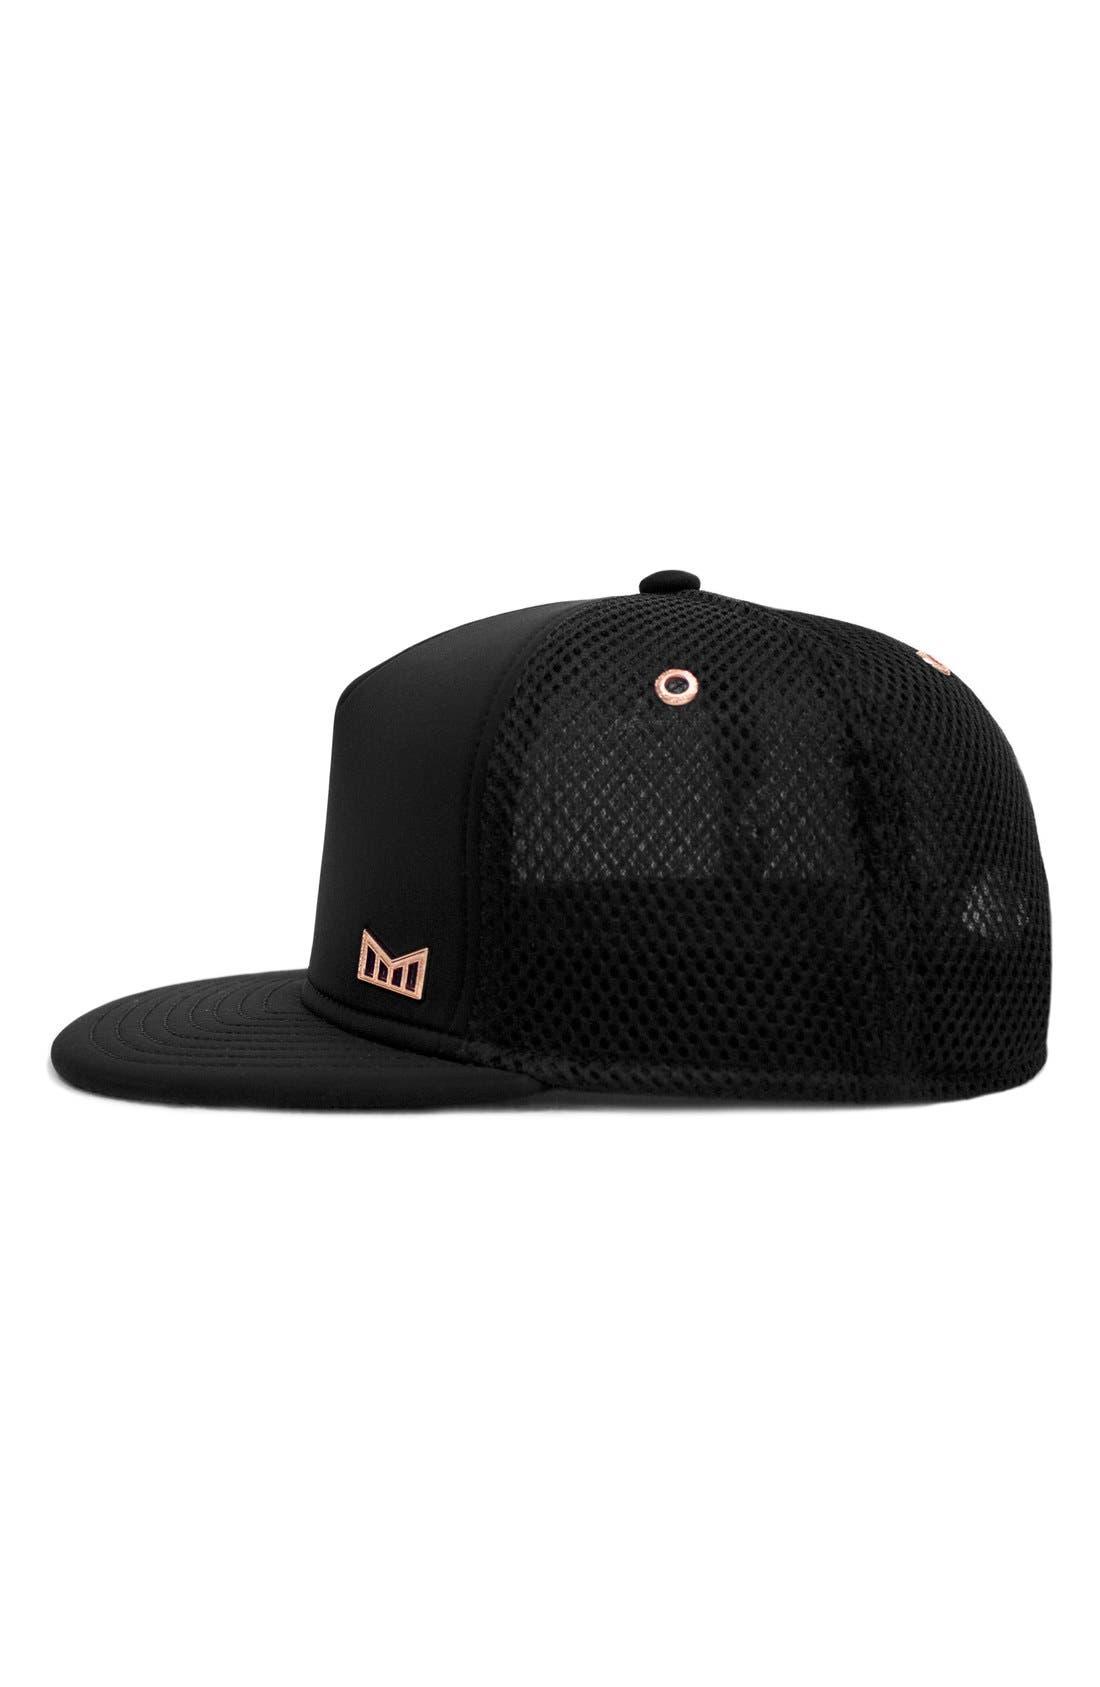 'The Majesty' Mesh Back Snapback Hat,                             Alternate thumbnail 4, color,                             BLACK